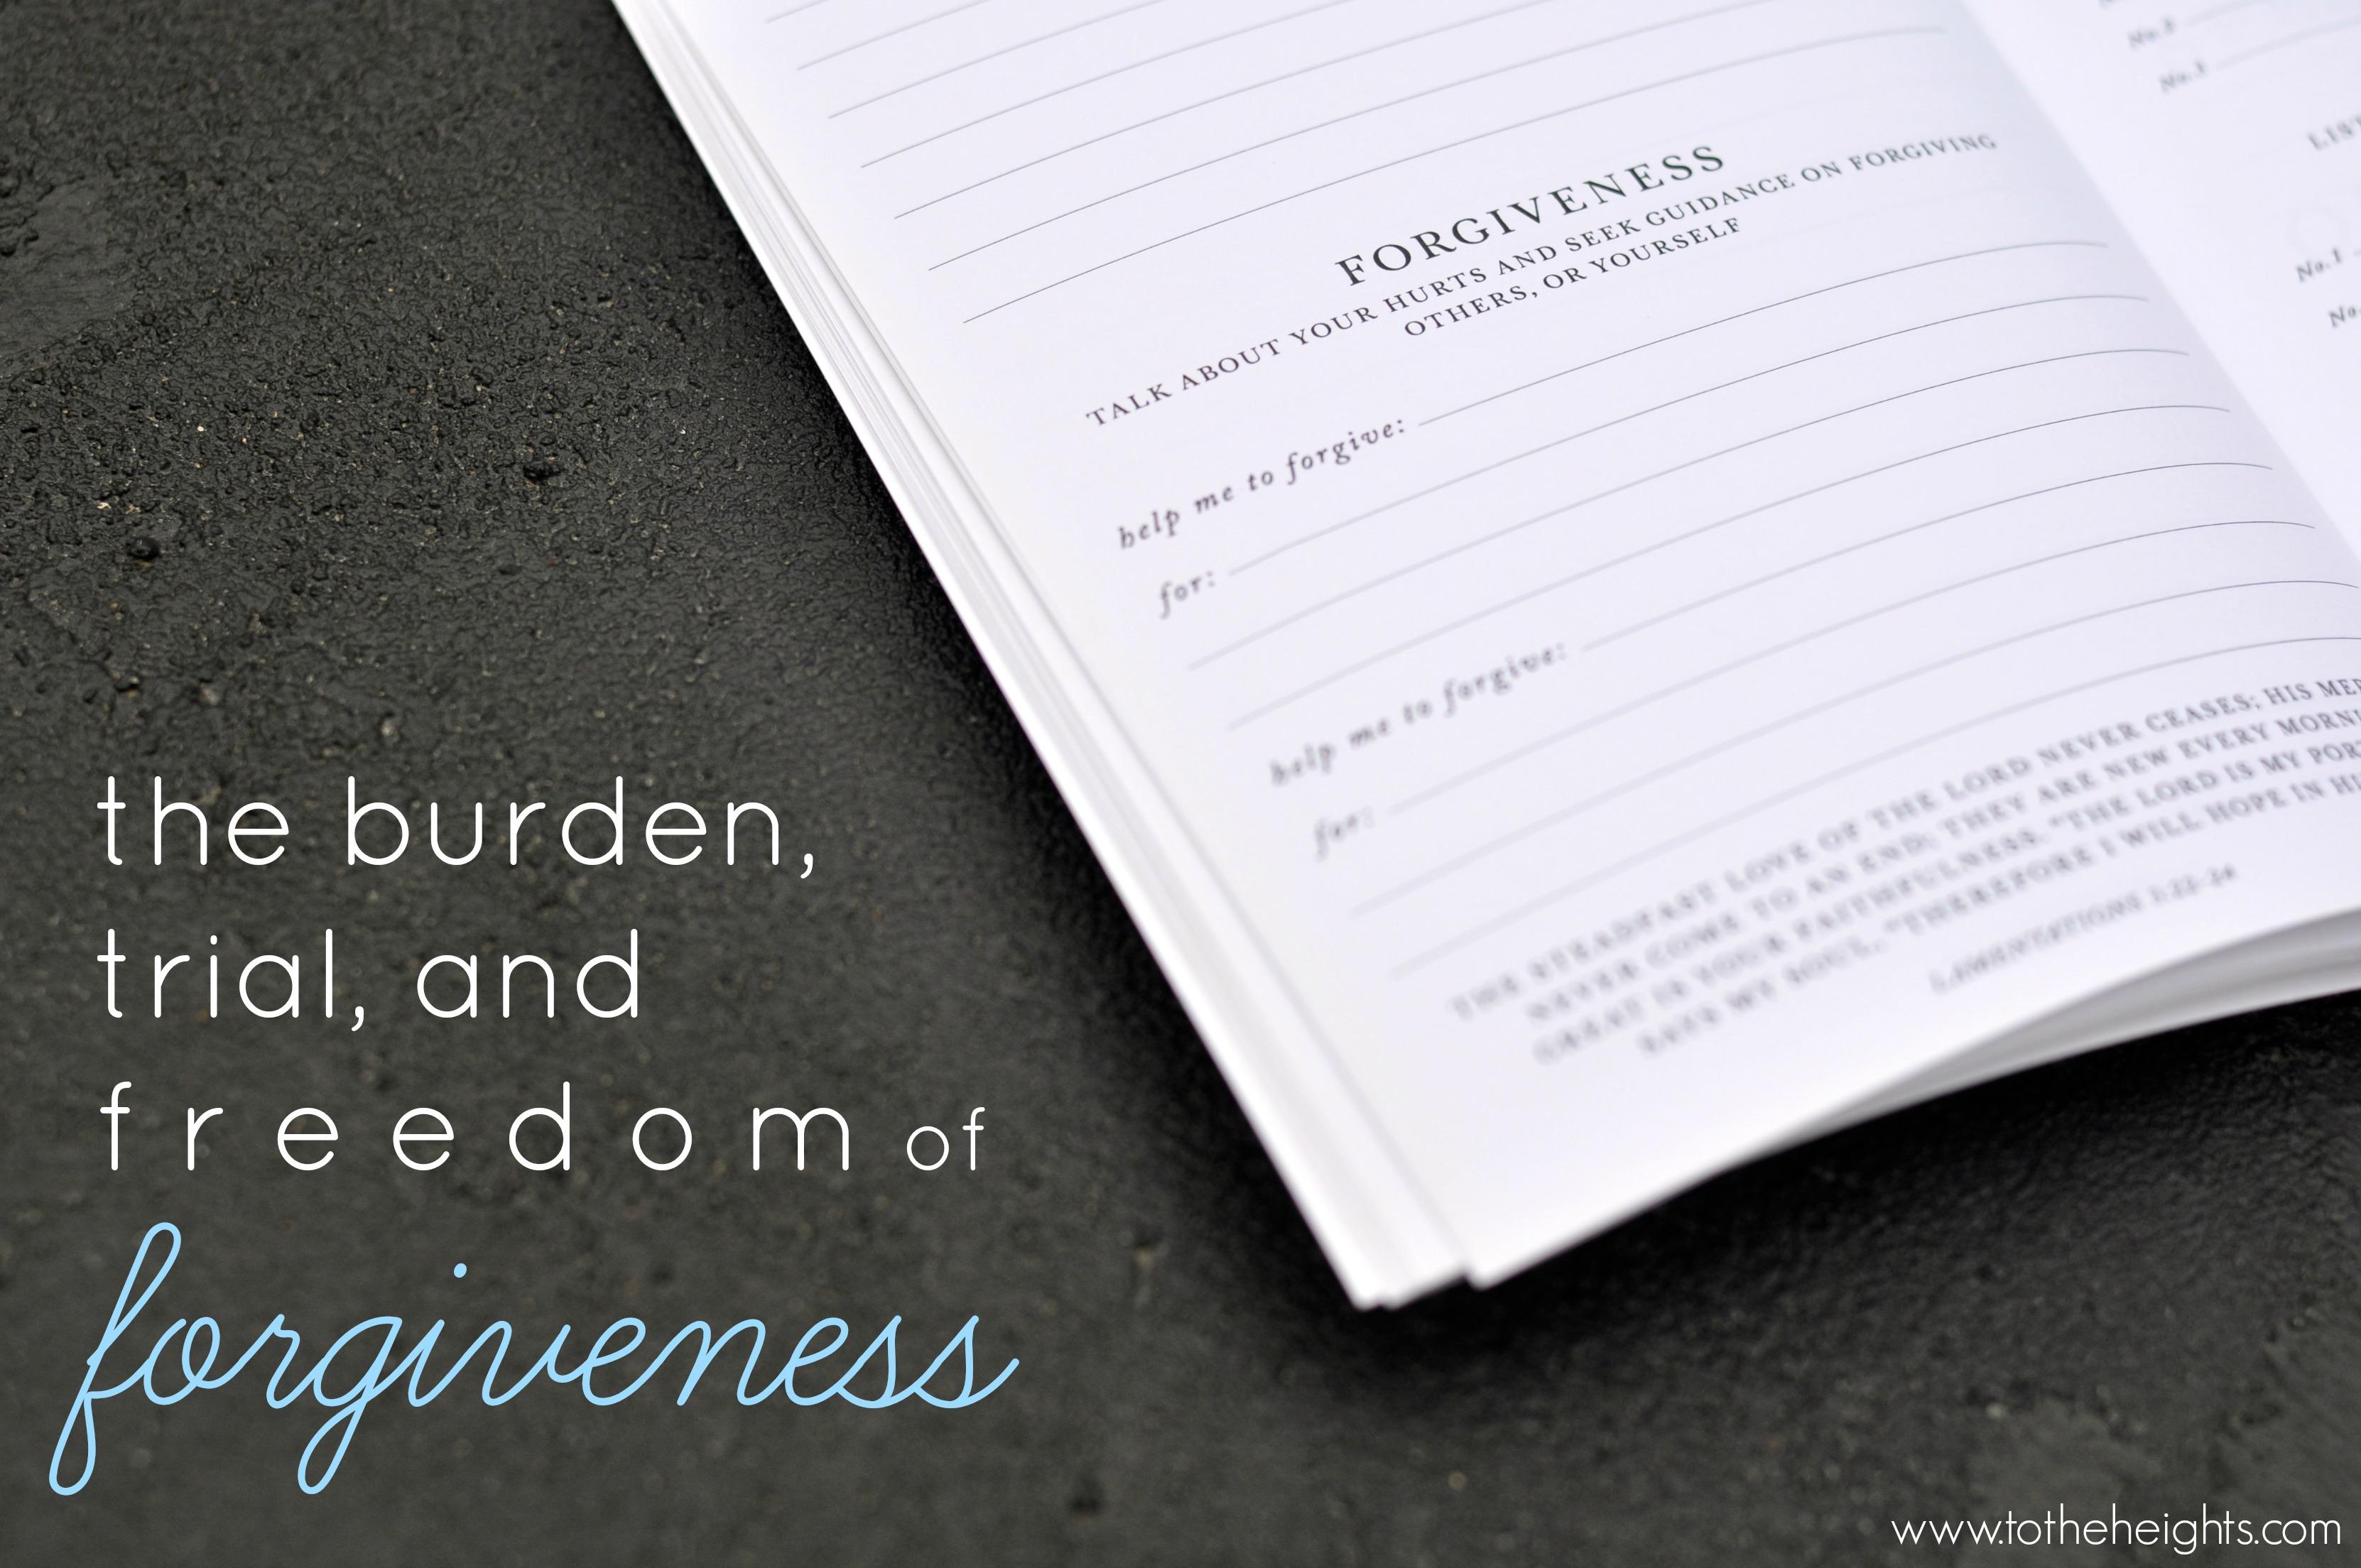 freedom-of-forgiveness